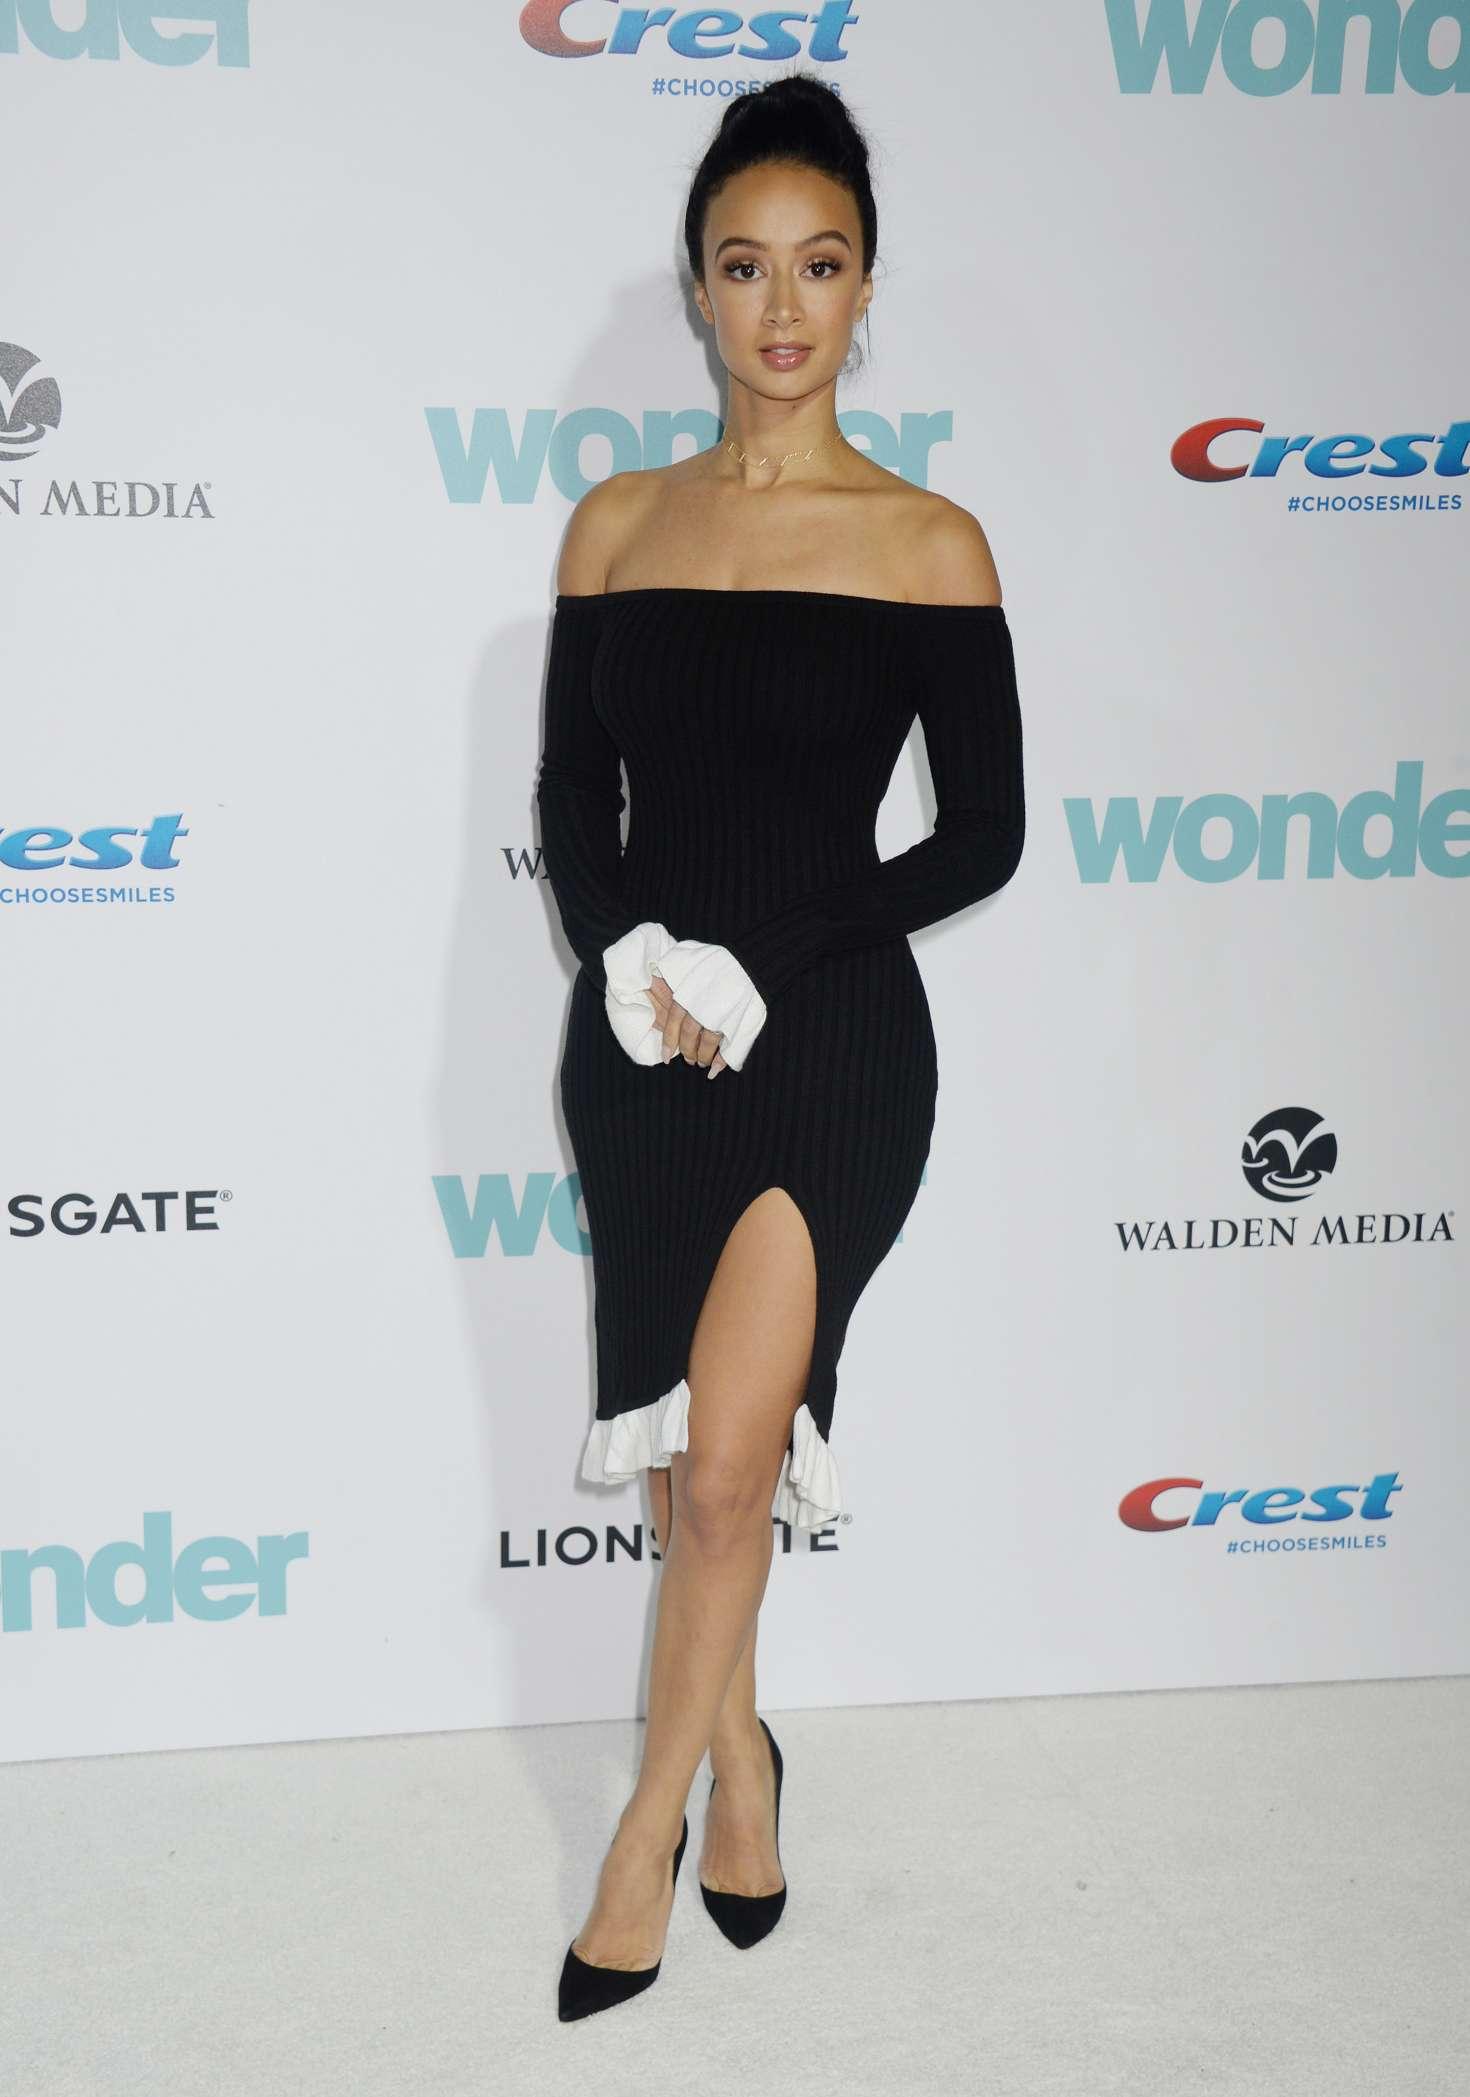 Draya Michele 2017 : Draya Michele: Wonder Premiere in Westwood -05